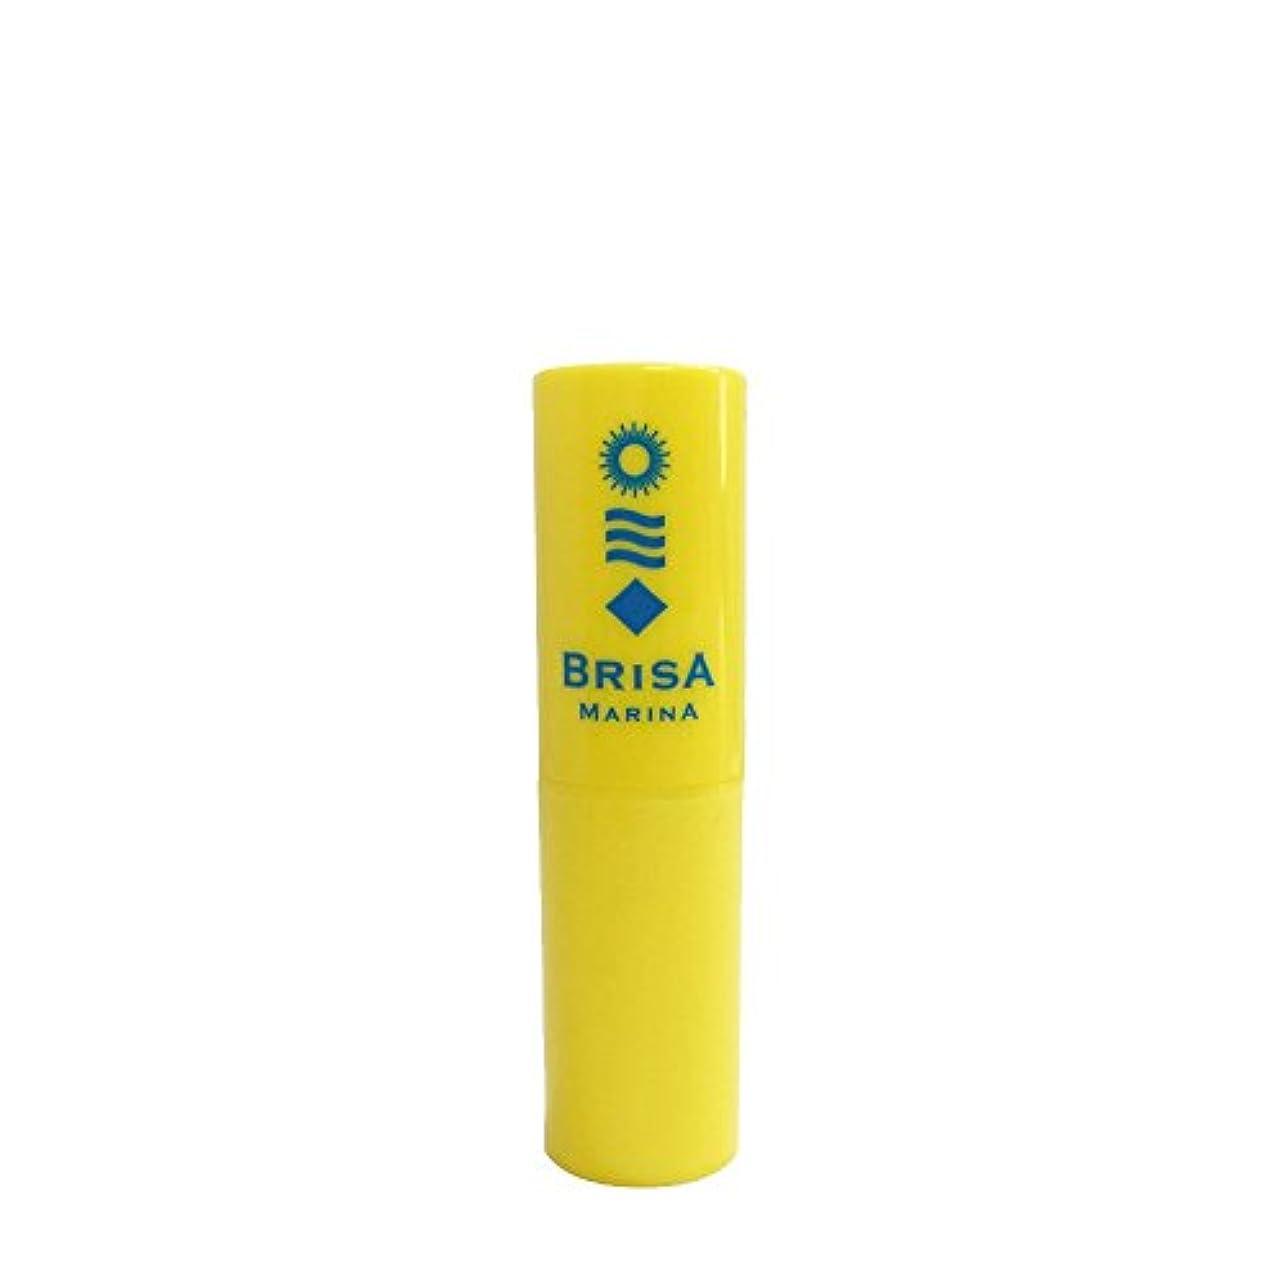 BRISA MARINA(ブリサ マリーナ) 日焼け止めUVリップ(クリア) 3g[SPF32 PA+++] Z-0CBM0016200 バリエーション不要